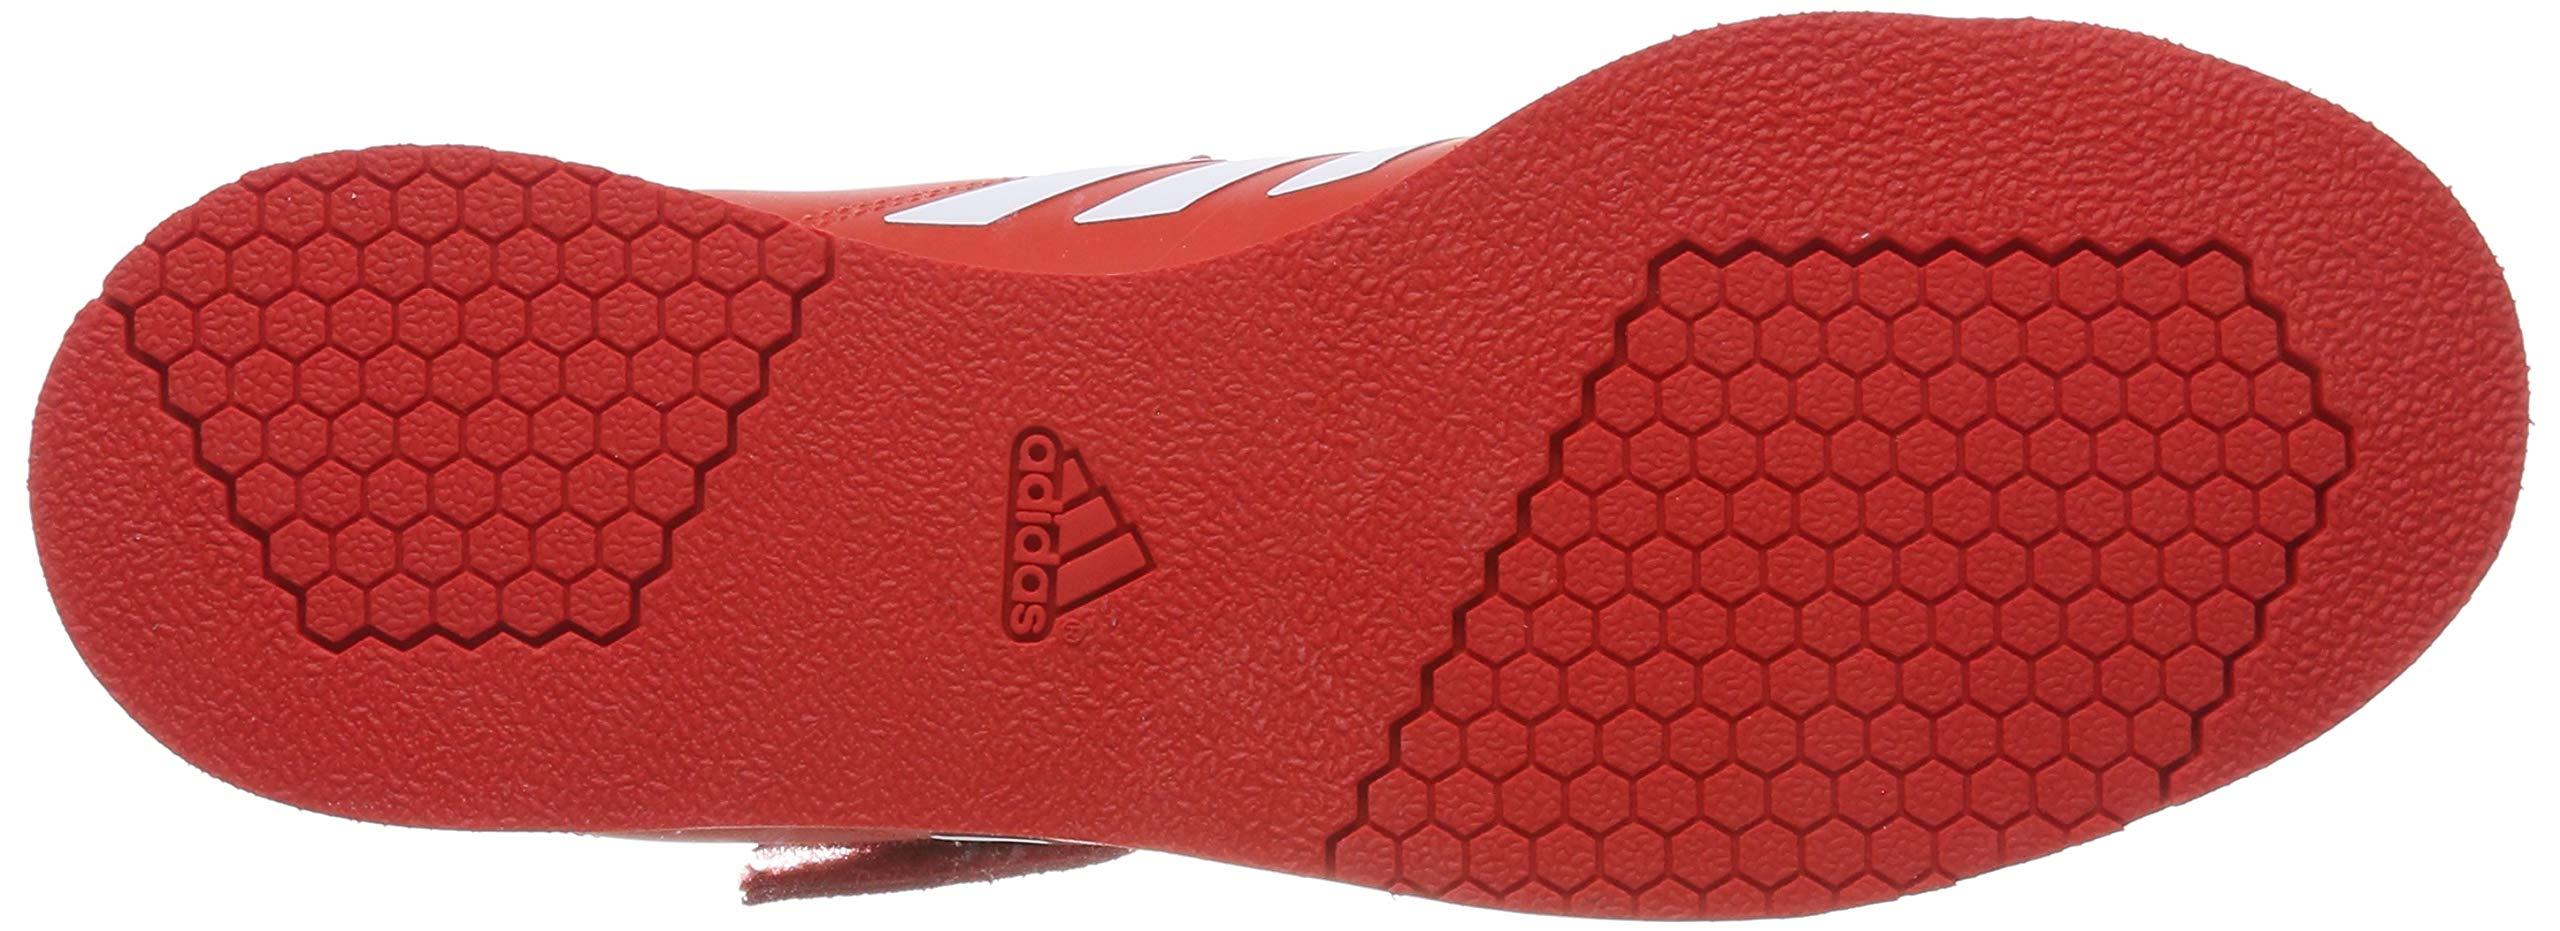 adidas Power Perfect III, Scarpe da Fitness Uomo 3 spesavip